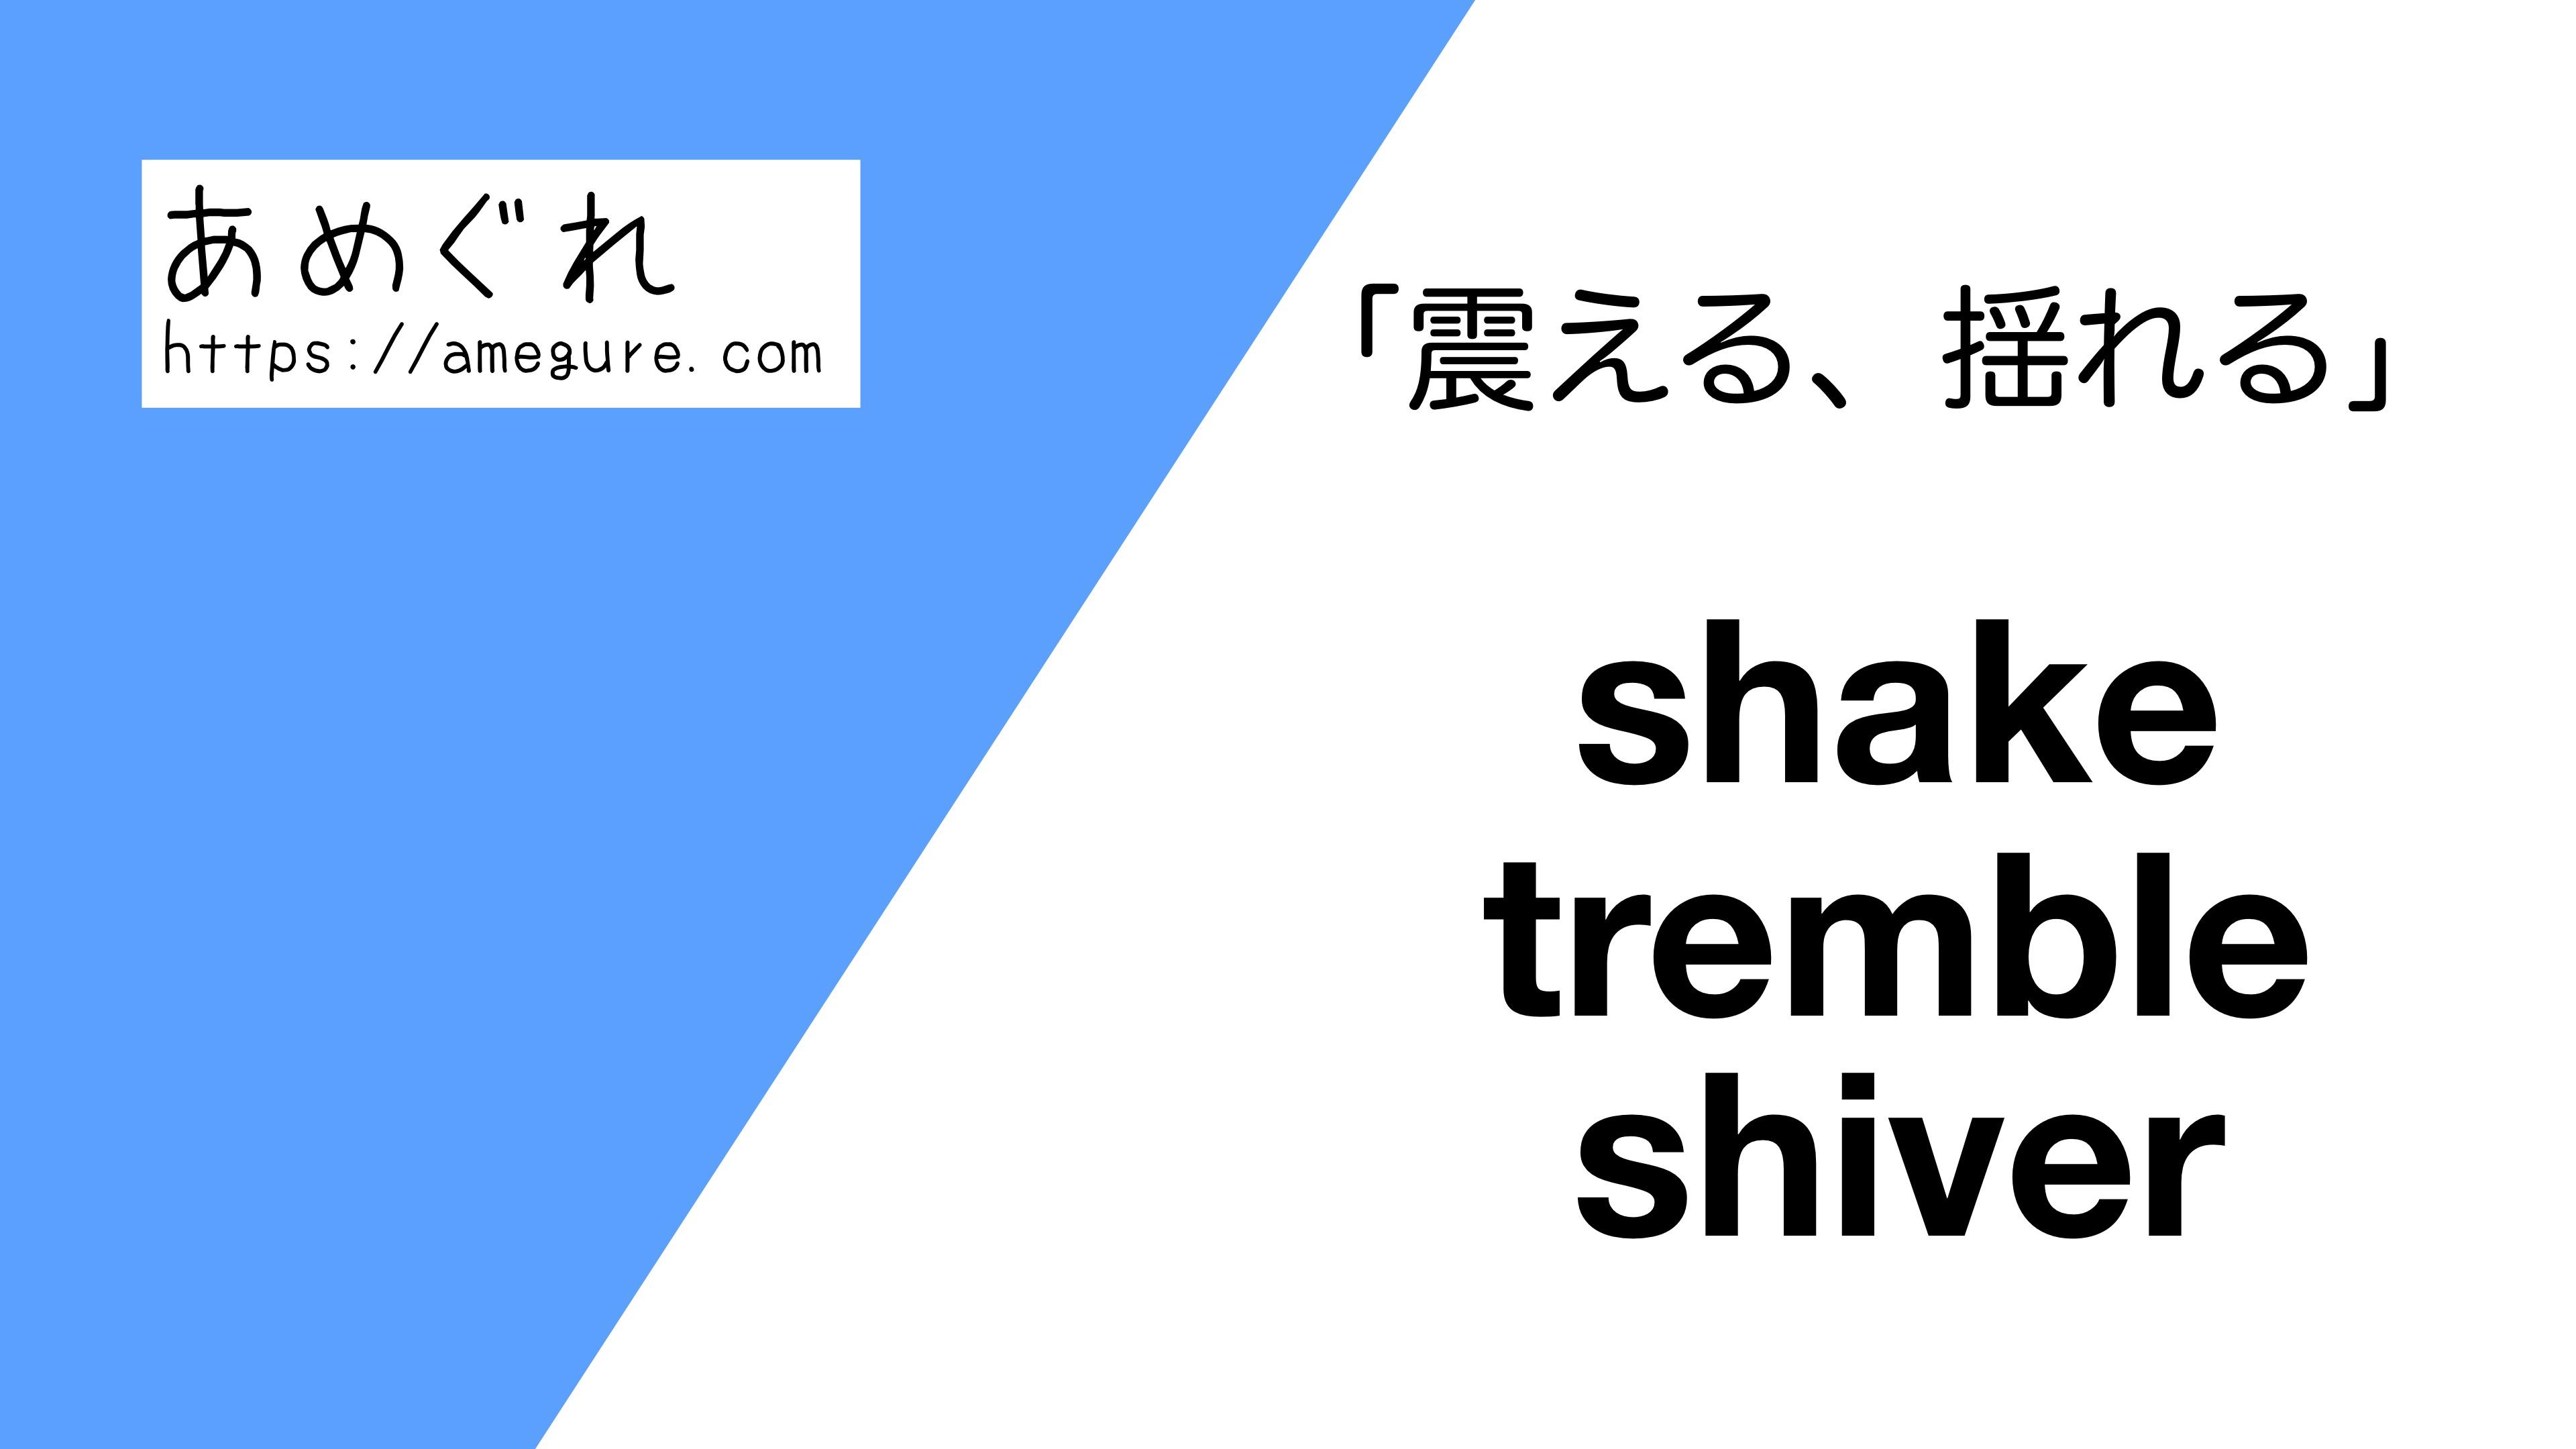 shake-tremble-shiver違い